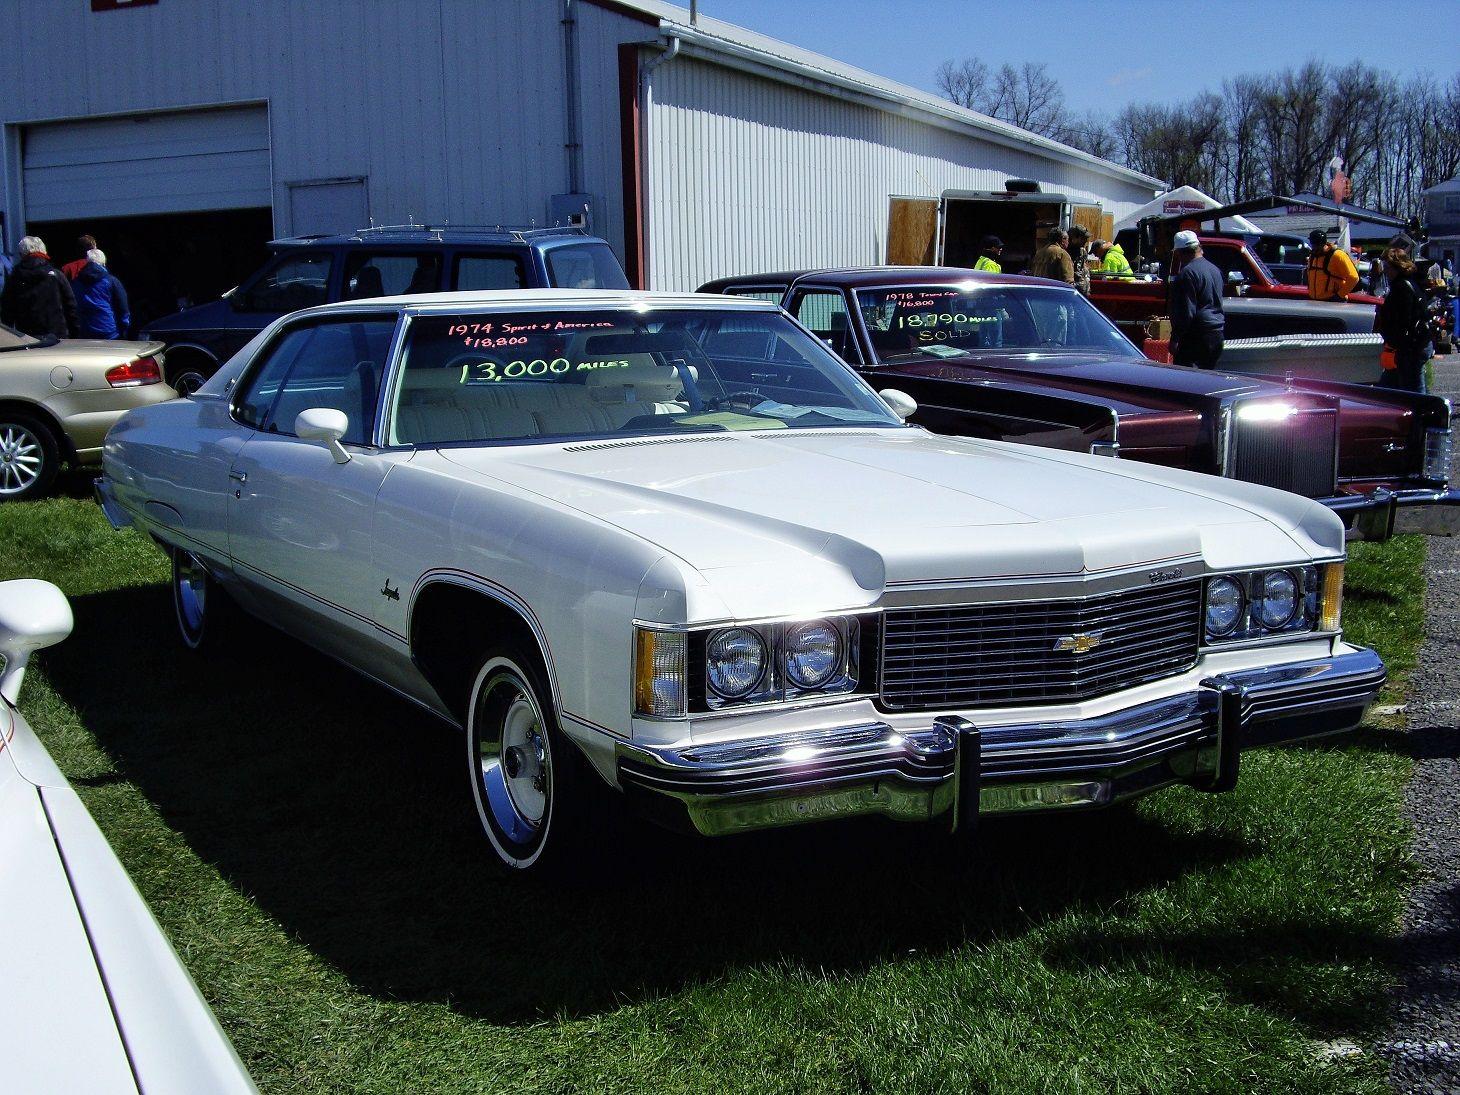 medium resolution of 1974 spirit of america chevrolet impala sport coupe